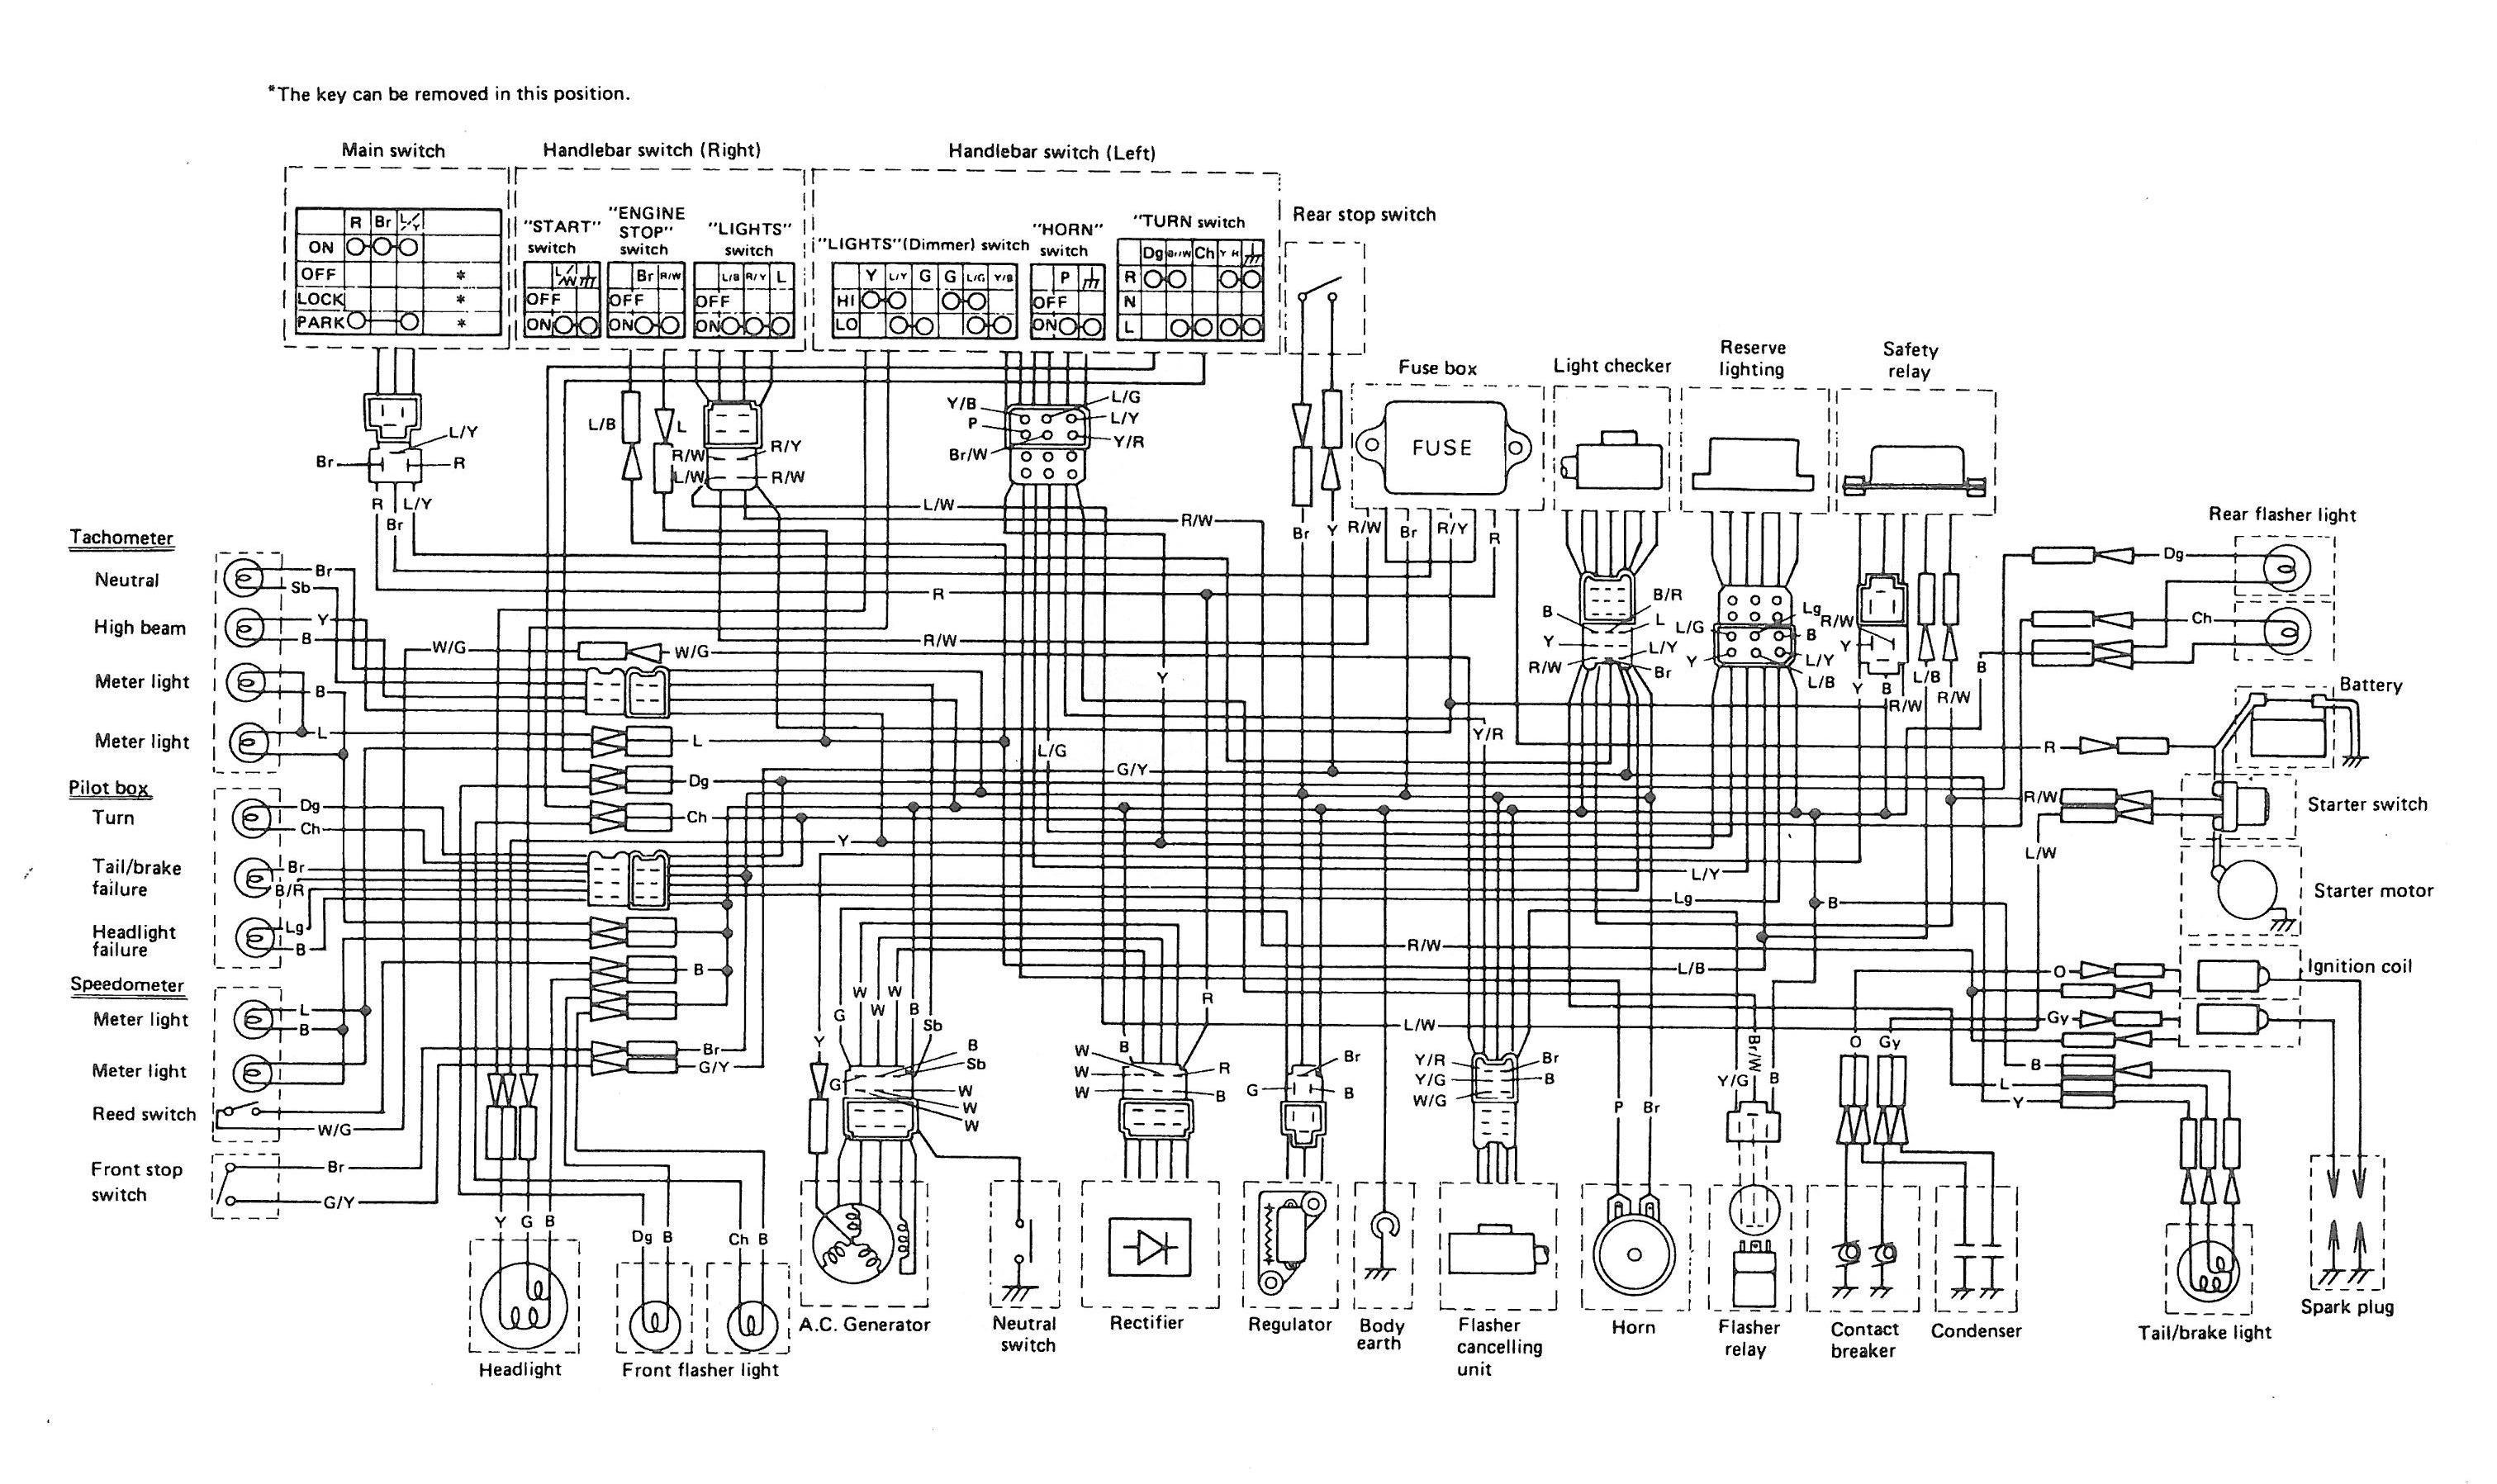 Yamaha Engine Diagram Wiring Diagram as Well Yamaha Maxim Wiring Diagram Yamaha Xs 650 Of Yamaha Engine Diagram